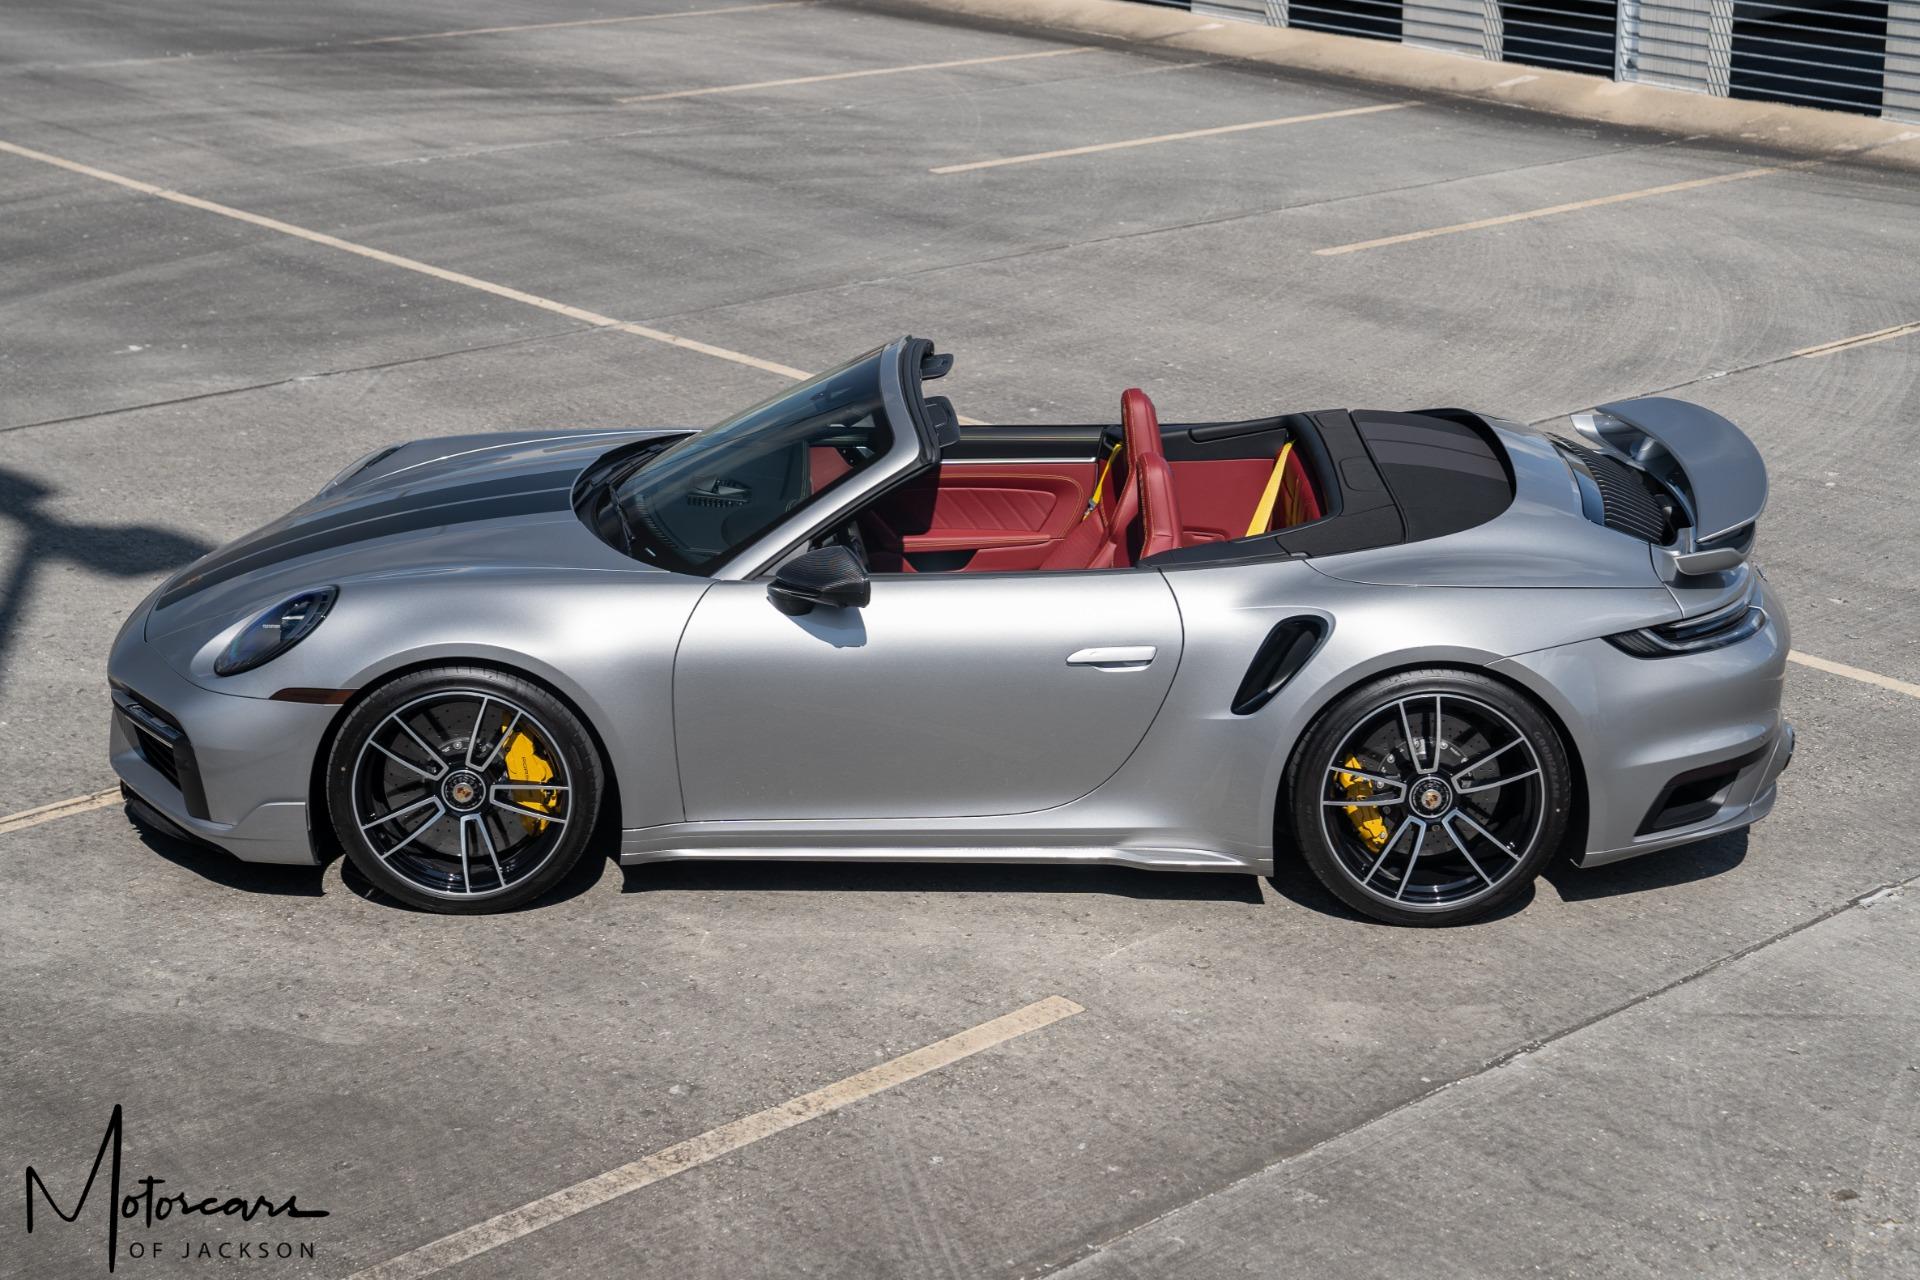 Used-2021-Porsche-911-Turbo-S-Cabriolet-Jackson-MS